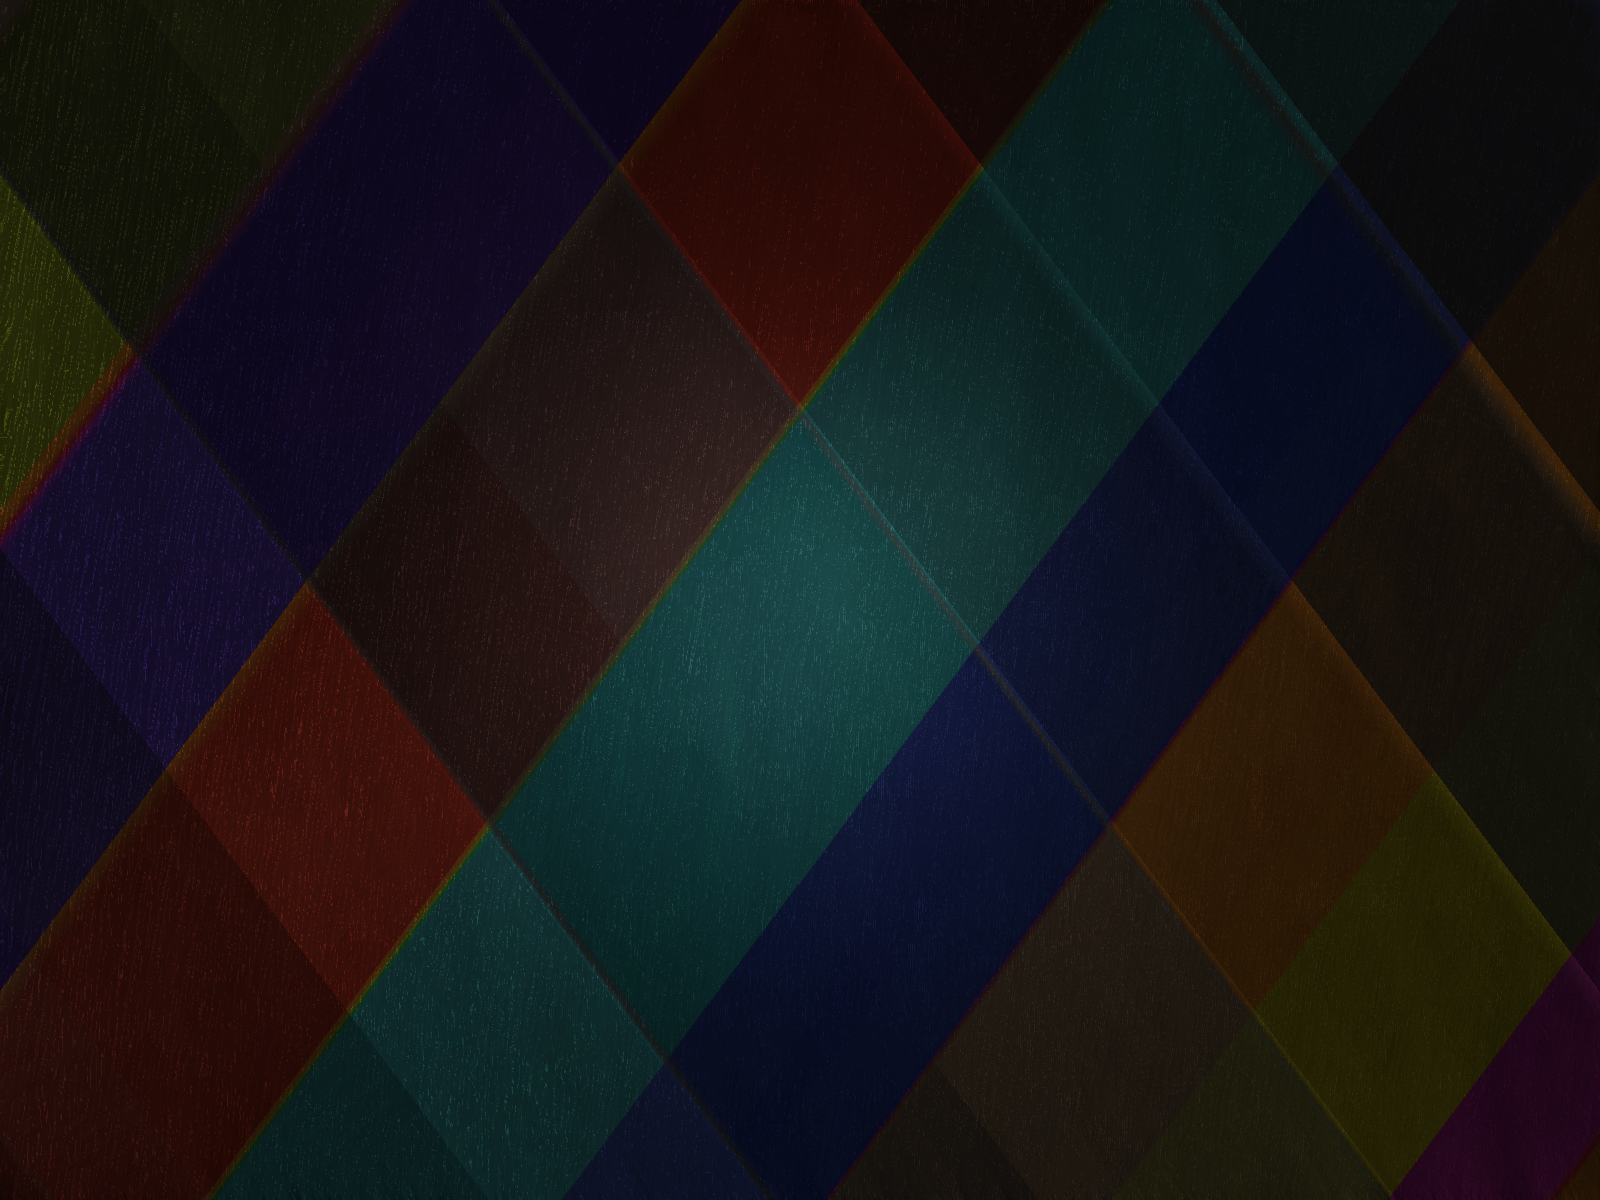 free wallpapers, wallpapers, linux wallpapers, desktop wallpapers